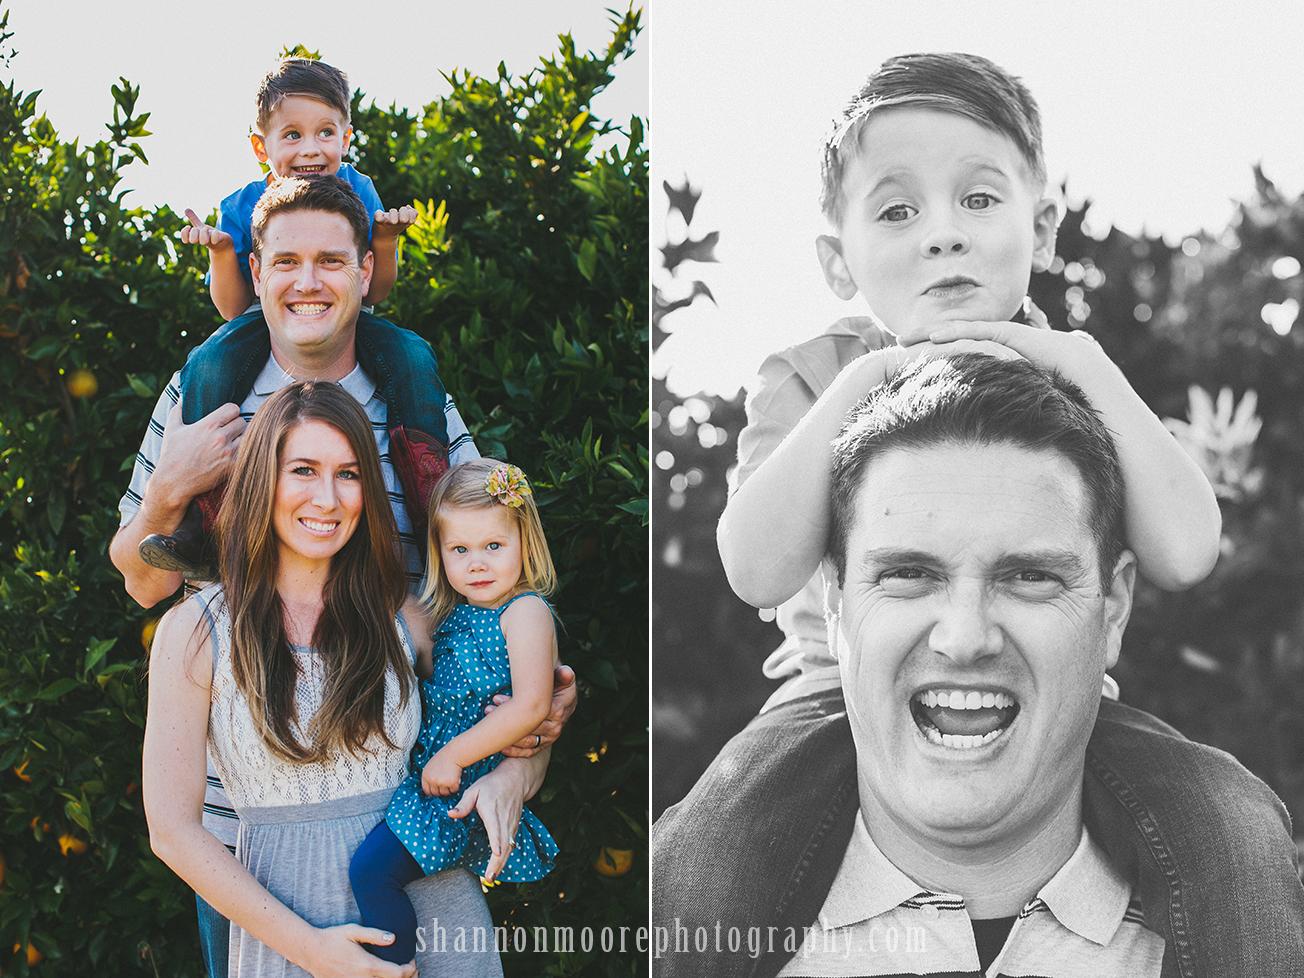 ShannonMoorePhotography-FamilyPhotography-SanLuisObispo-Ca-03